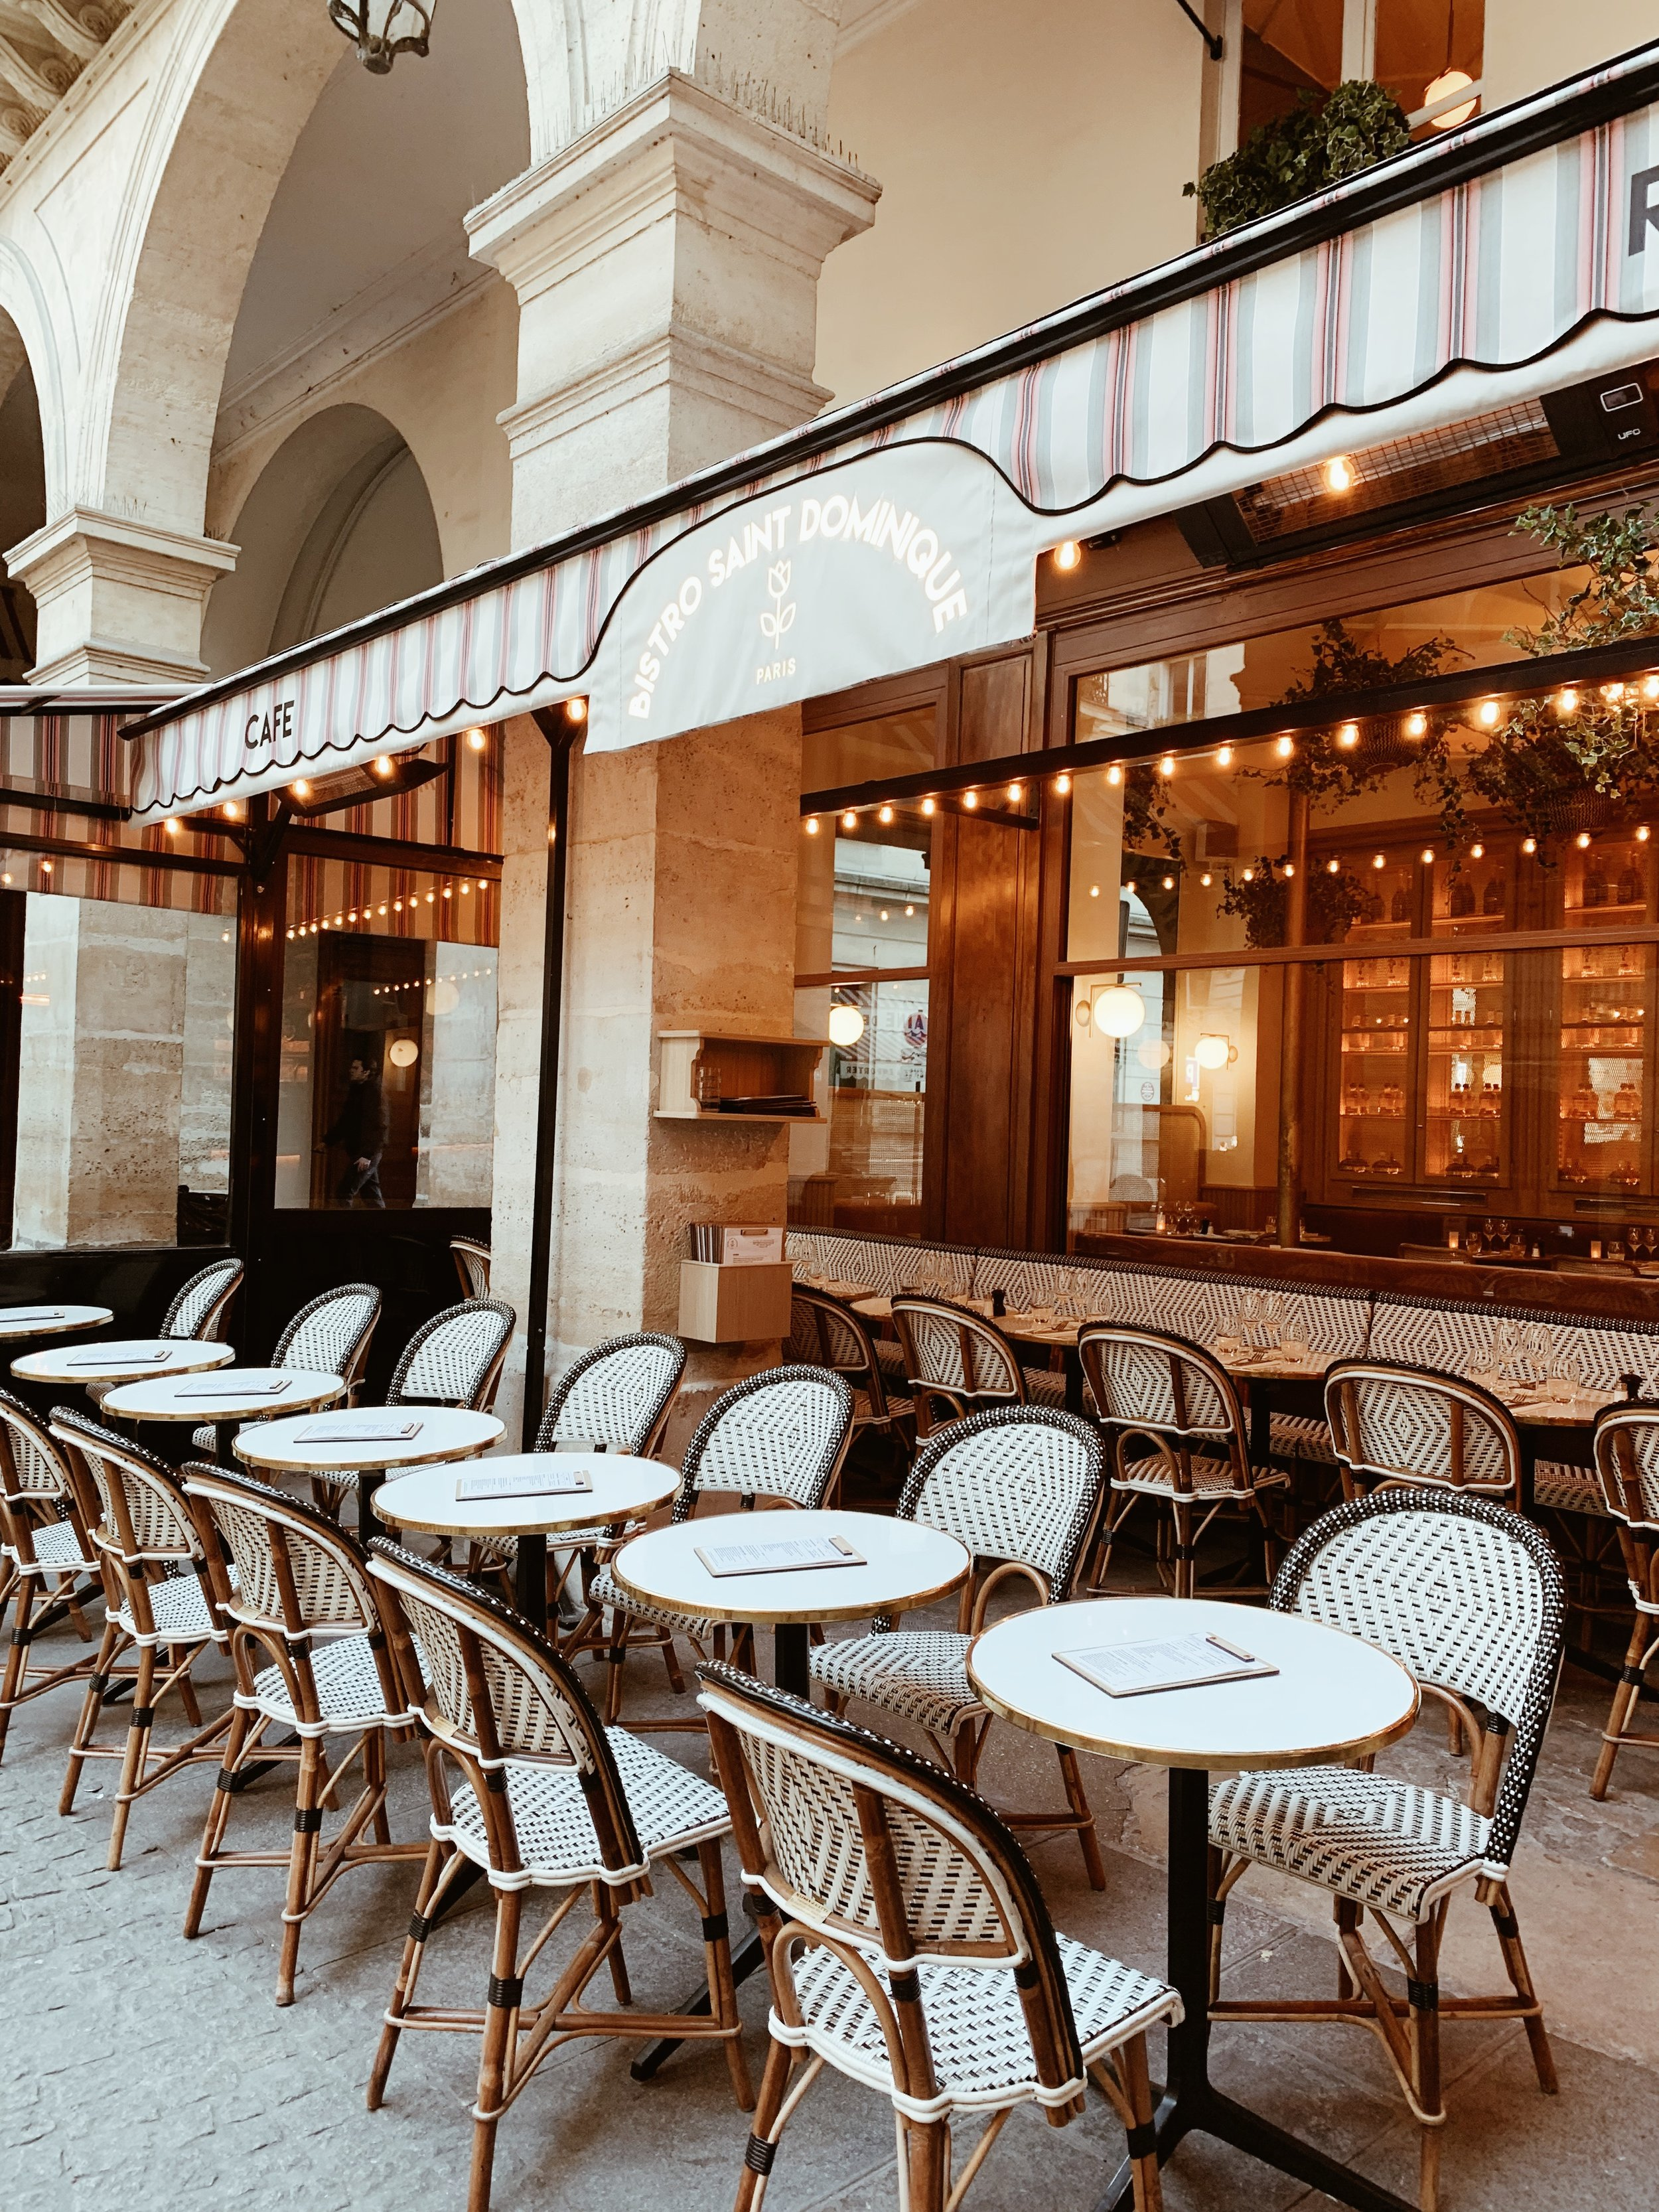 My favorite part of Paris is all the cafes, each as good as the next //  Bistro Saint Dominique